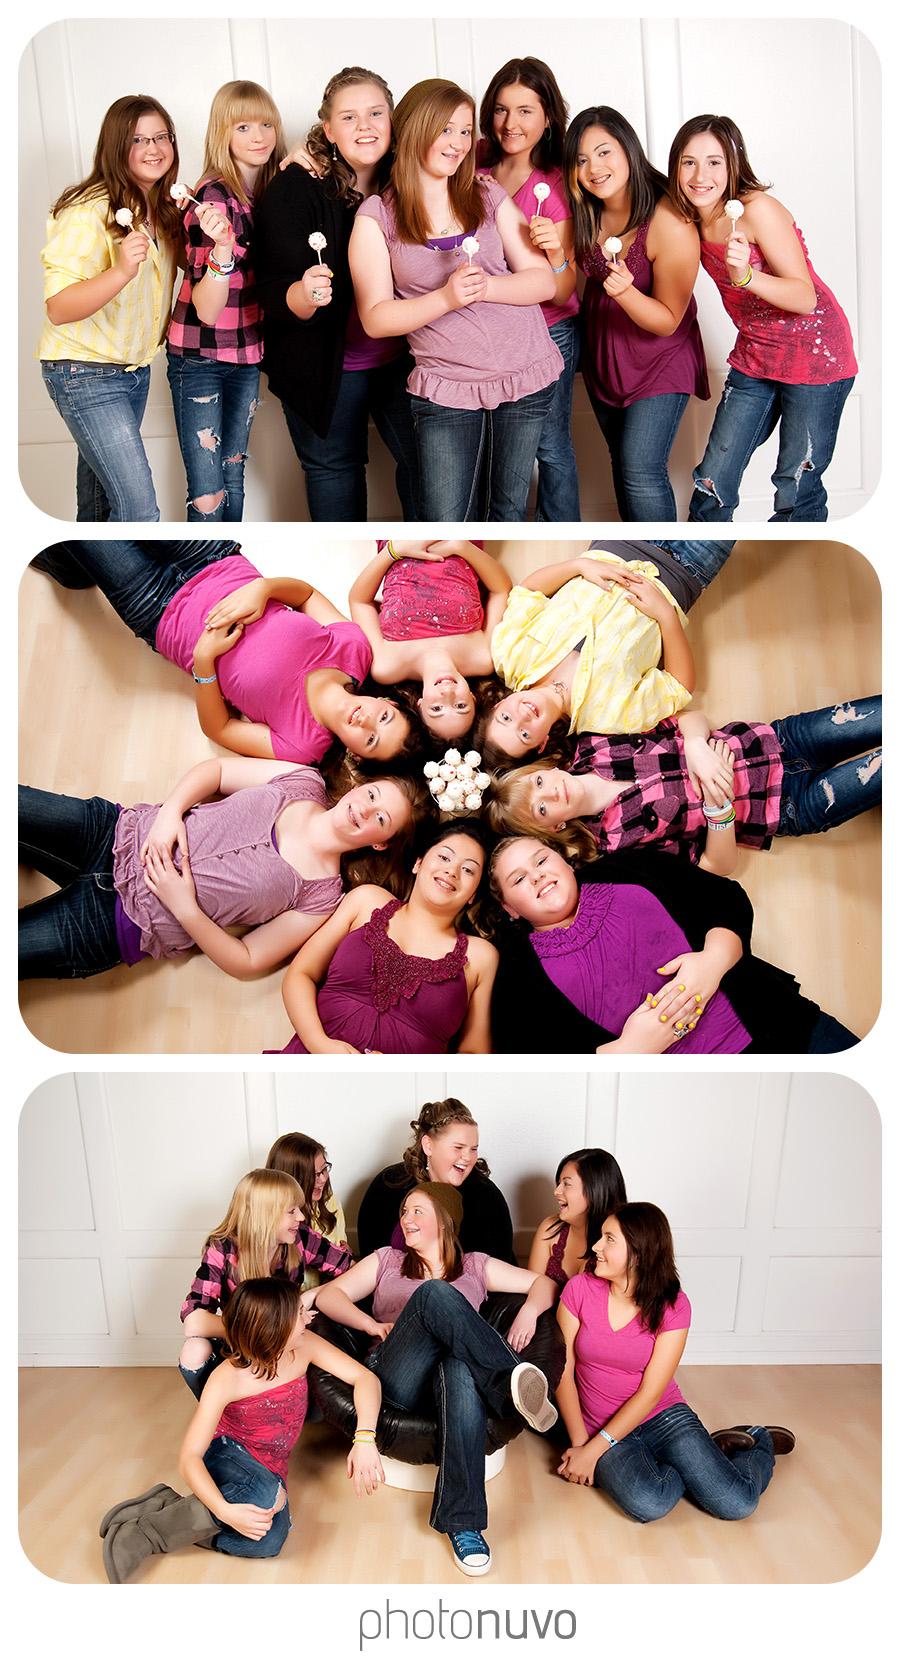 tween-photo-party-photonuvo